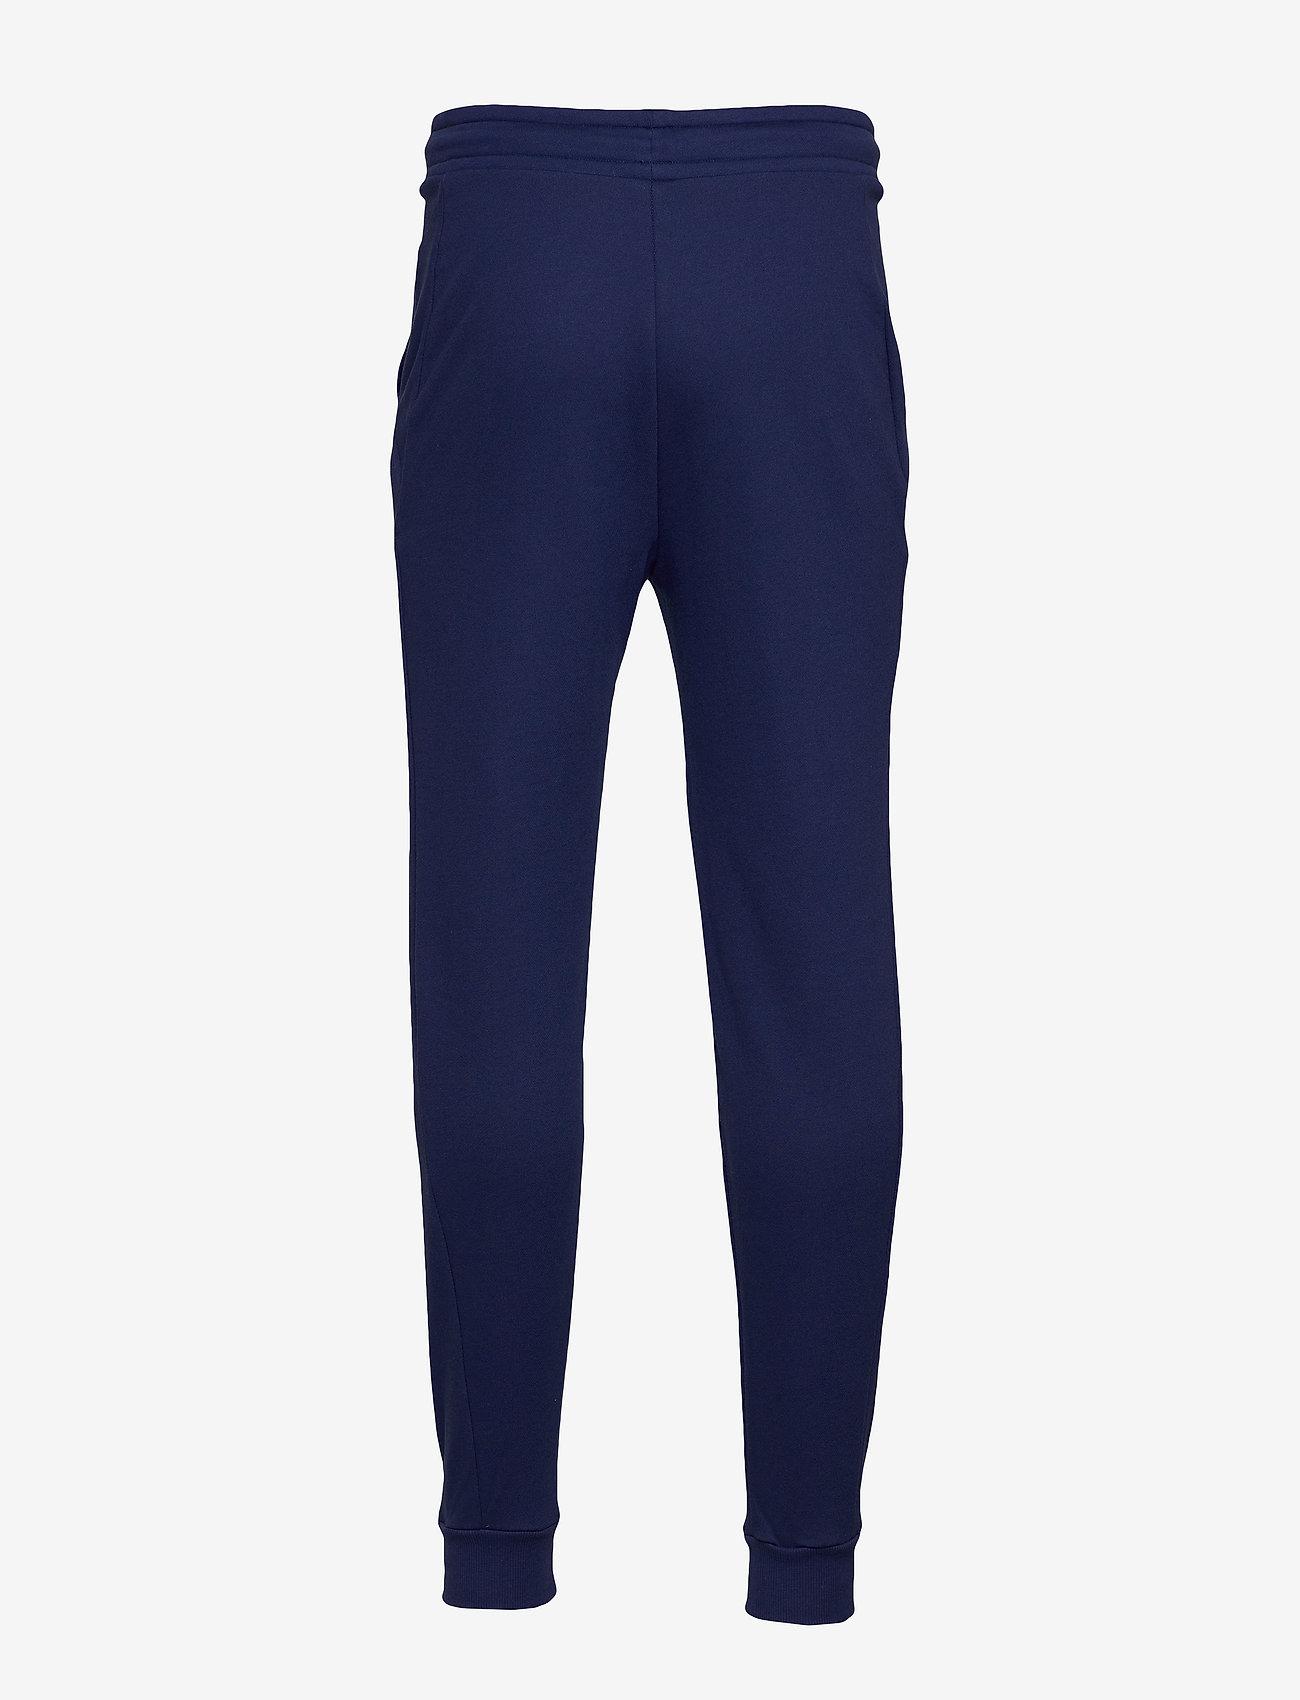 Tommy Sport - CUFF FLEECE PANT HBR - sweatpants - blue ink - 1